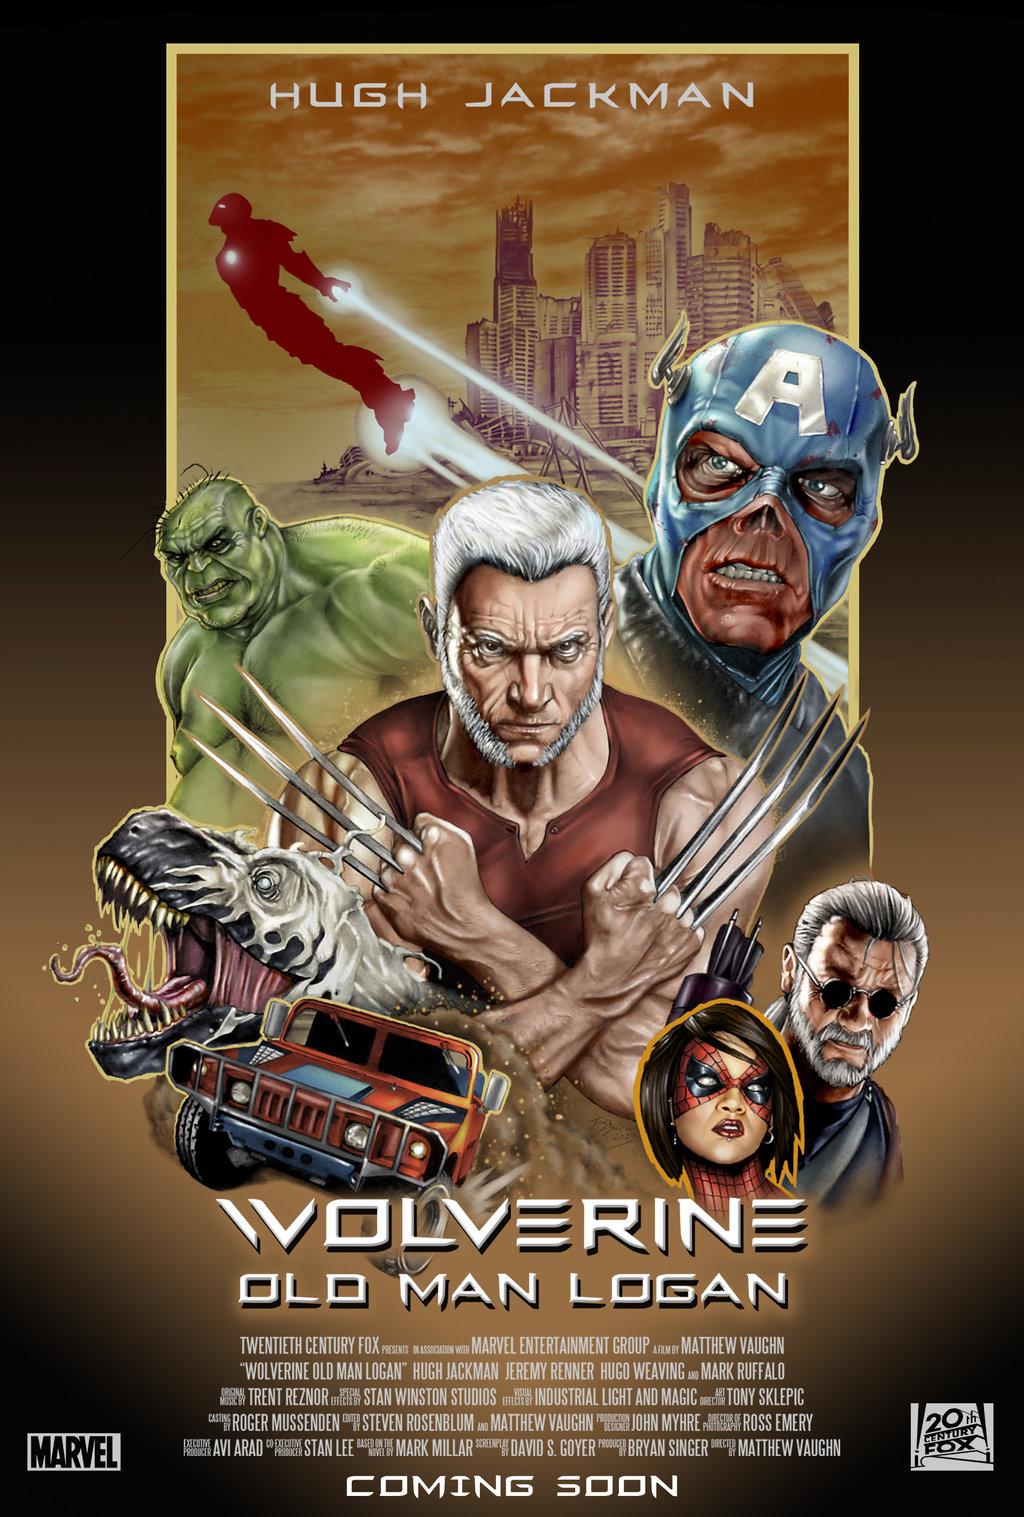 old_man_logan_movie_poster_by_draw4u-d8uyyp7